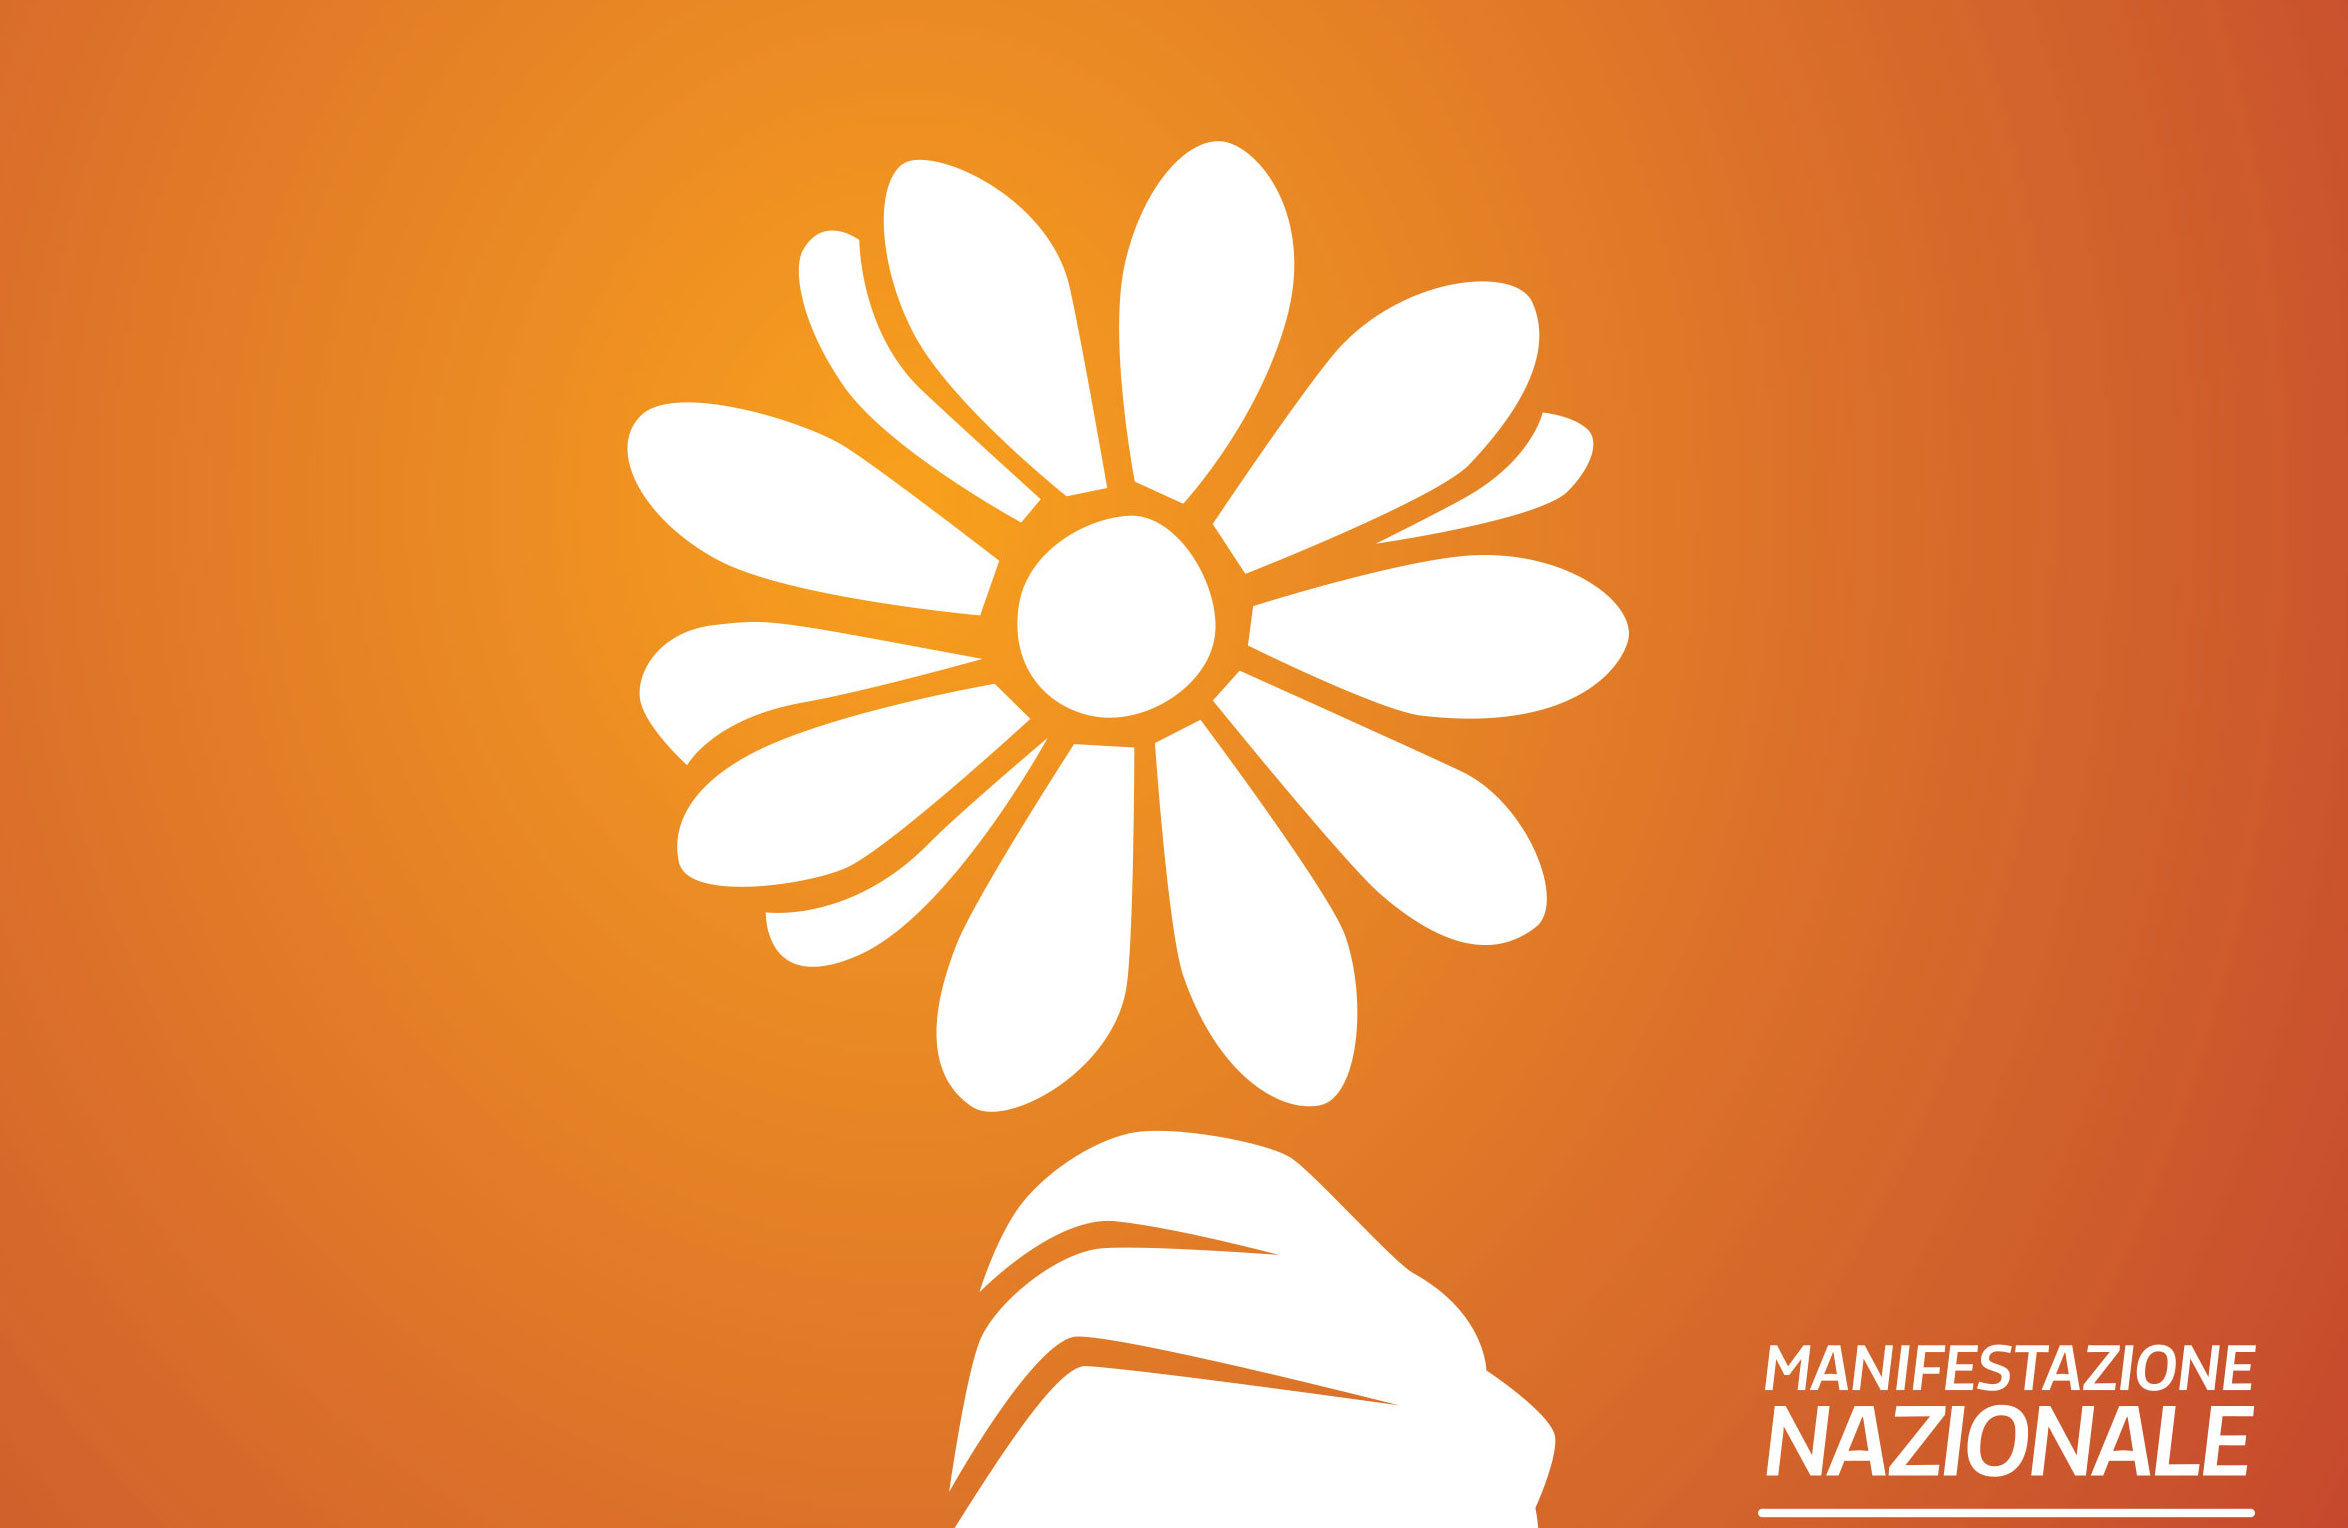 No a discriminazioni e xenofobia: sabato 9 dicembre a Como